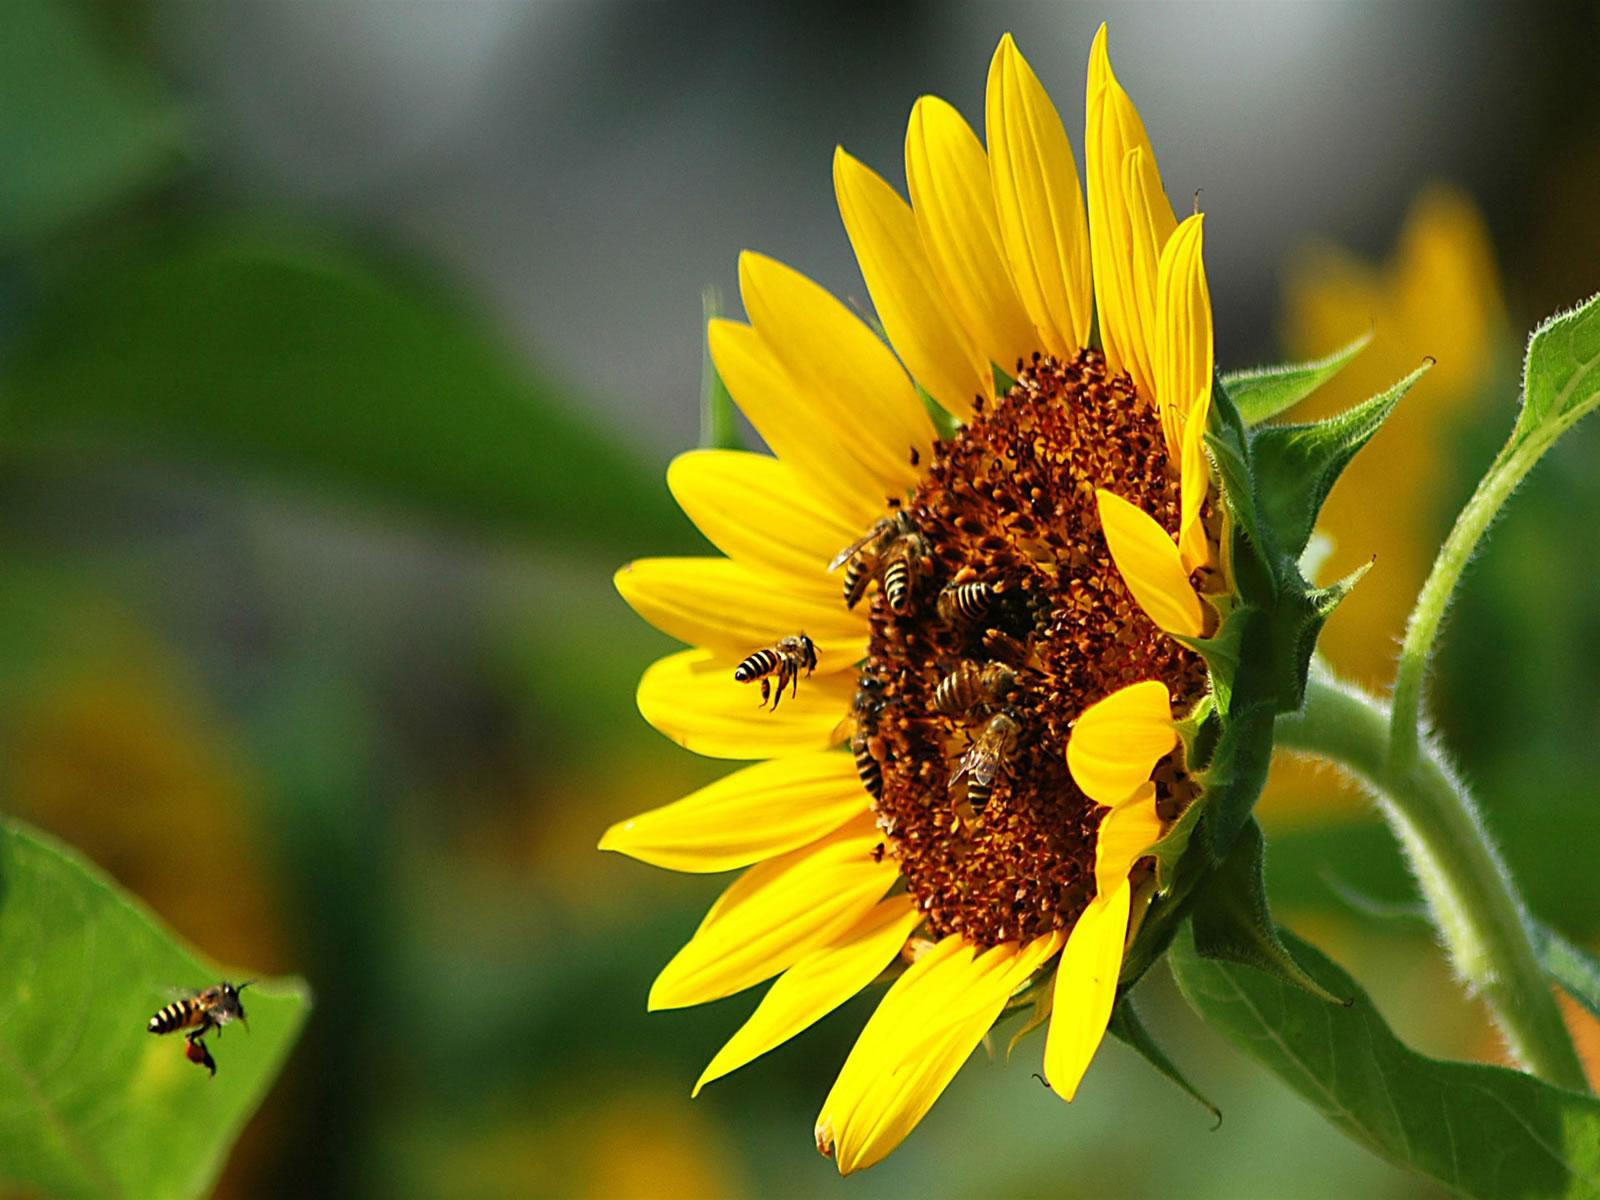 Image Detail for - http://4.bp.blogspot.com/-BqQ5lC5sBi4/TZNGtuS2SAI/AAAAAAAAAHE/jLV3236VW1Q/s1600/abelhas-no-girassol-3fa9c.jpg